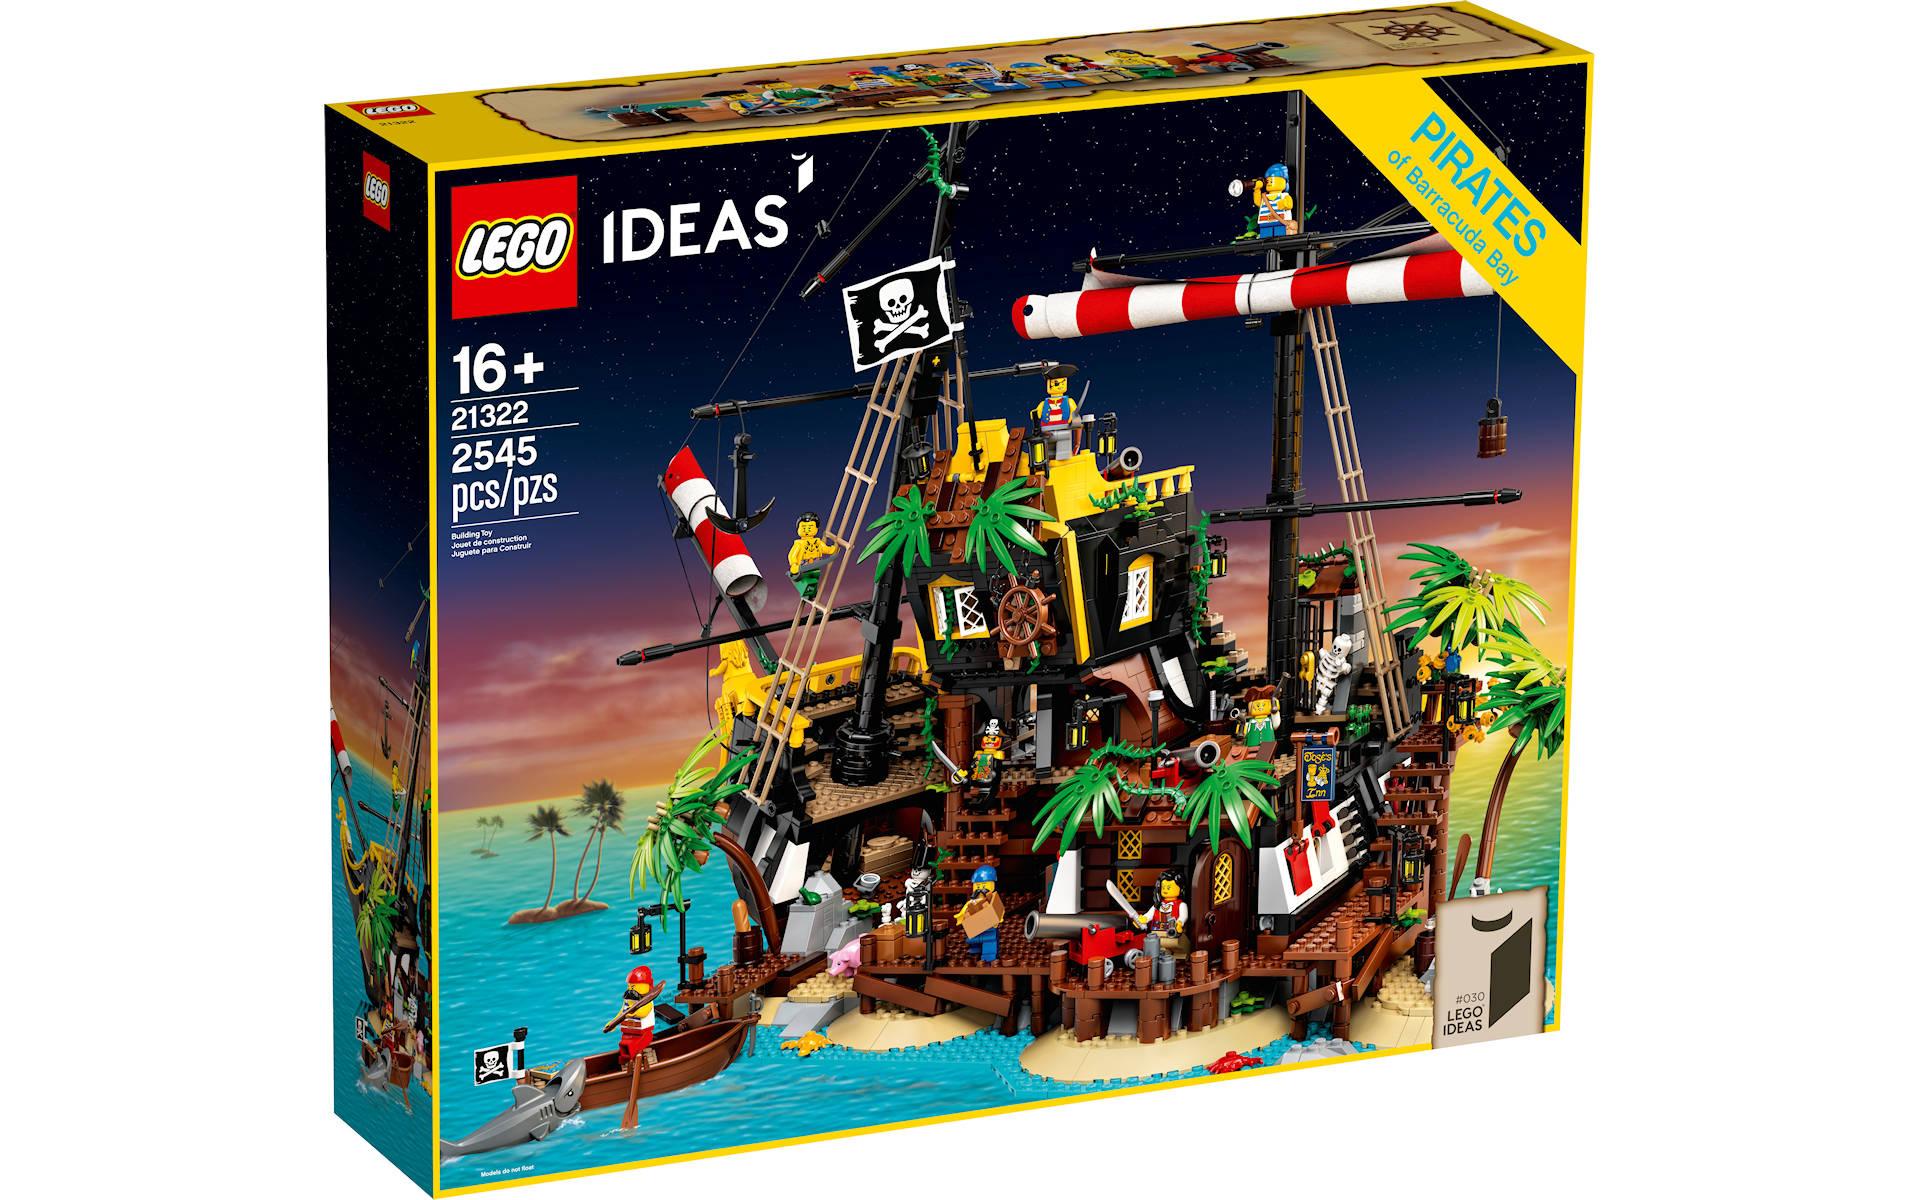 LEGO Ideas 21322 Pirates Bay